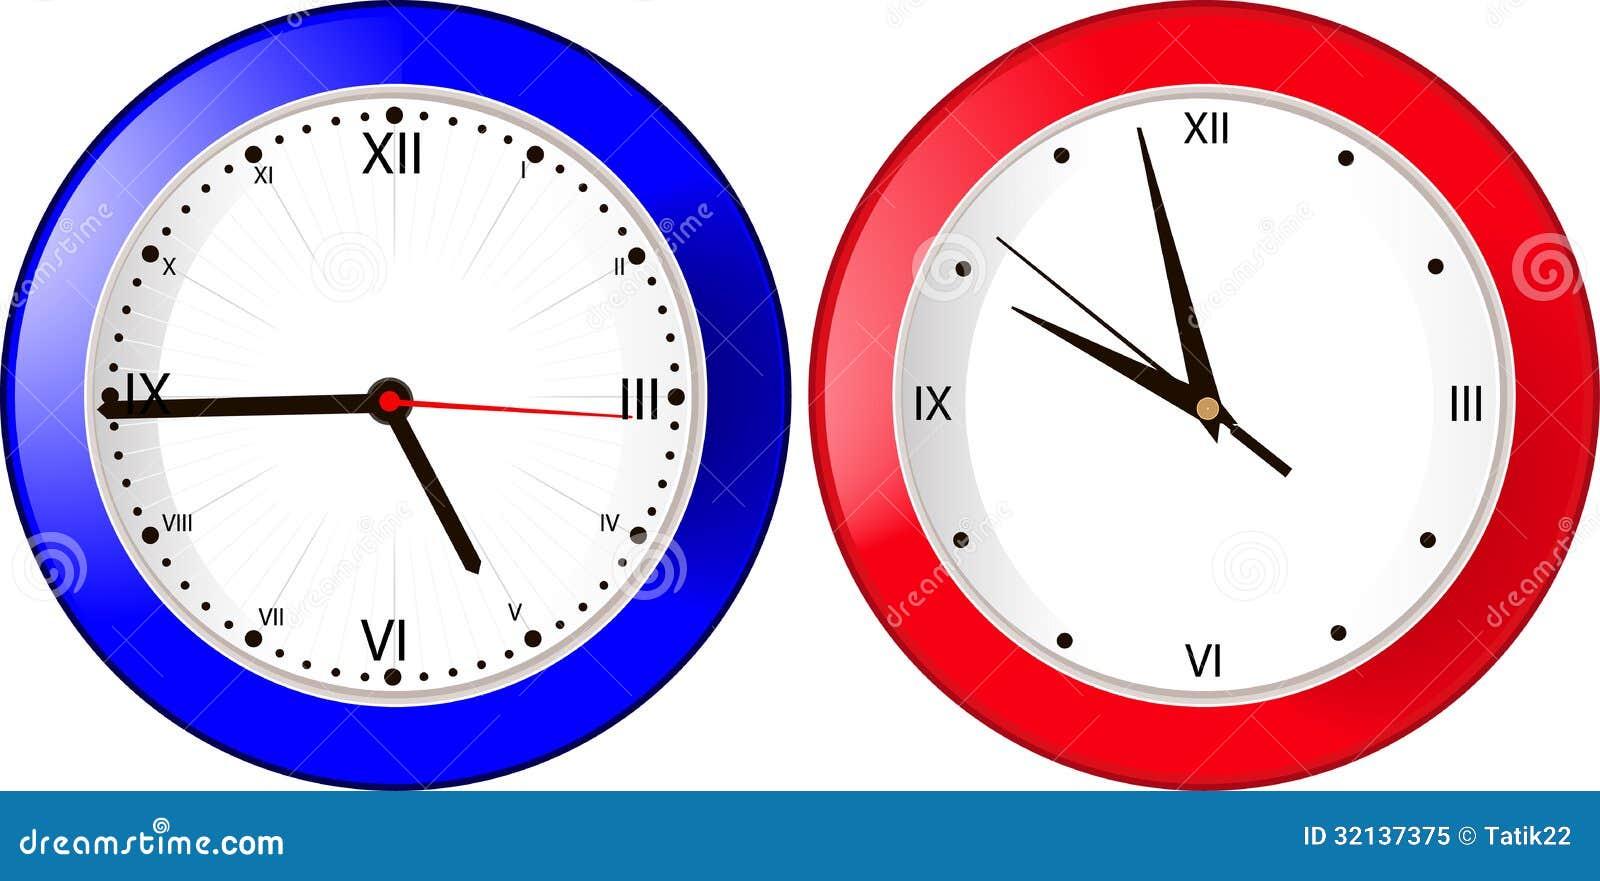 horloge murale bleue et rouge image stock image du rond temps 32137375. Black Bedroom Furniture Sets. Home Design Ideas